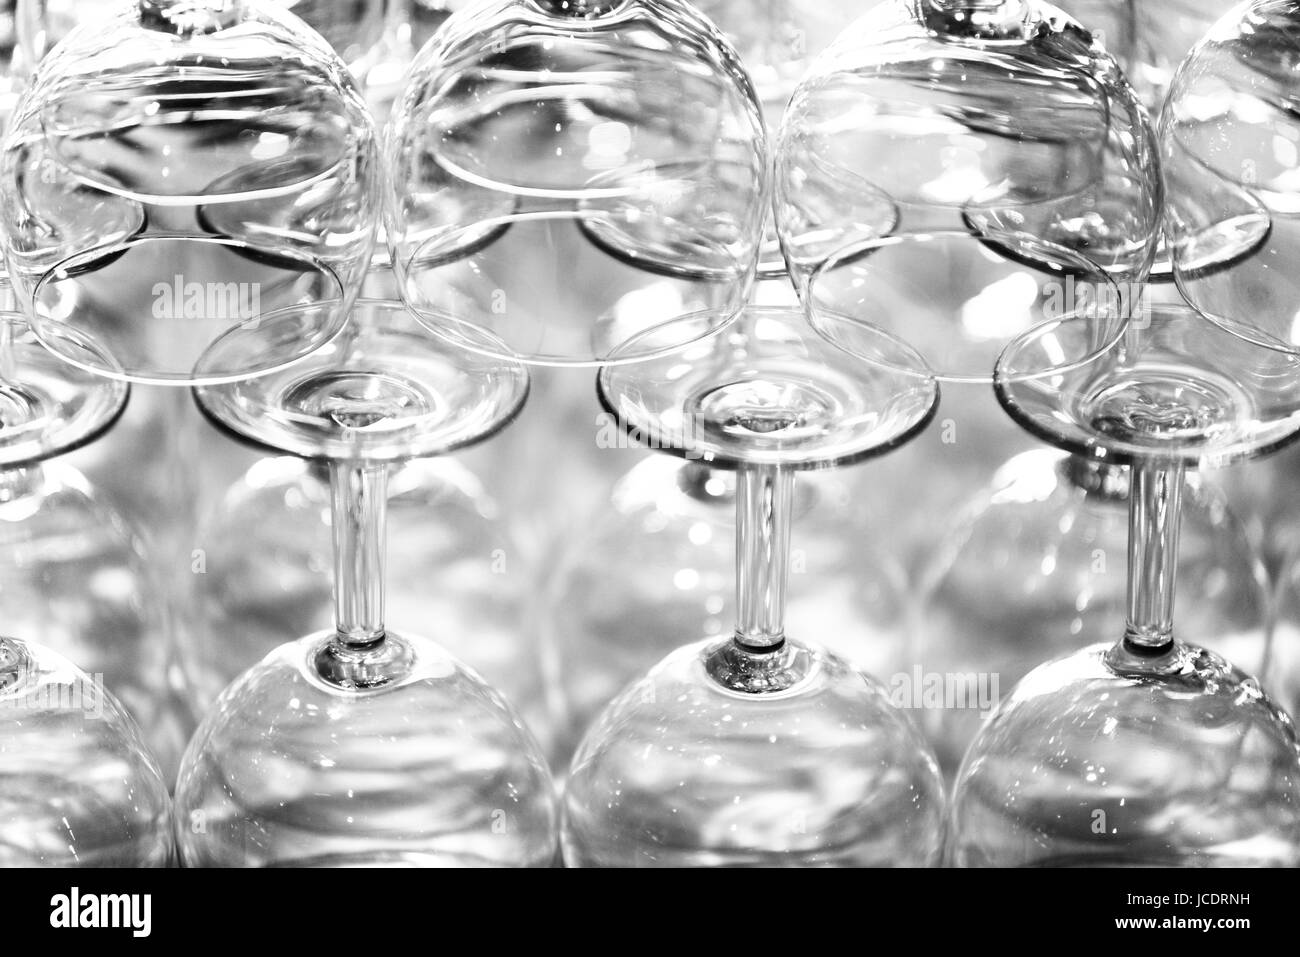 Stapel Mit Weingläsern Stockbild